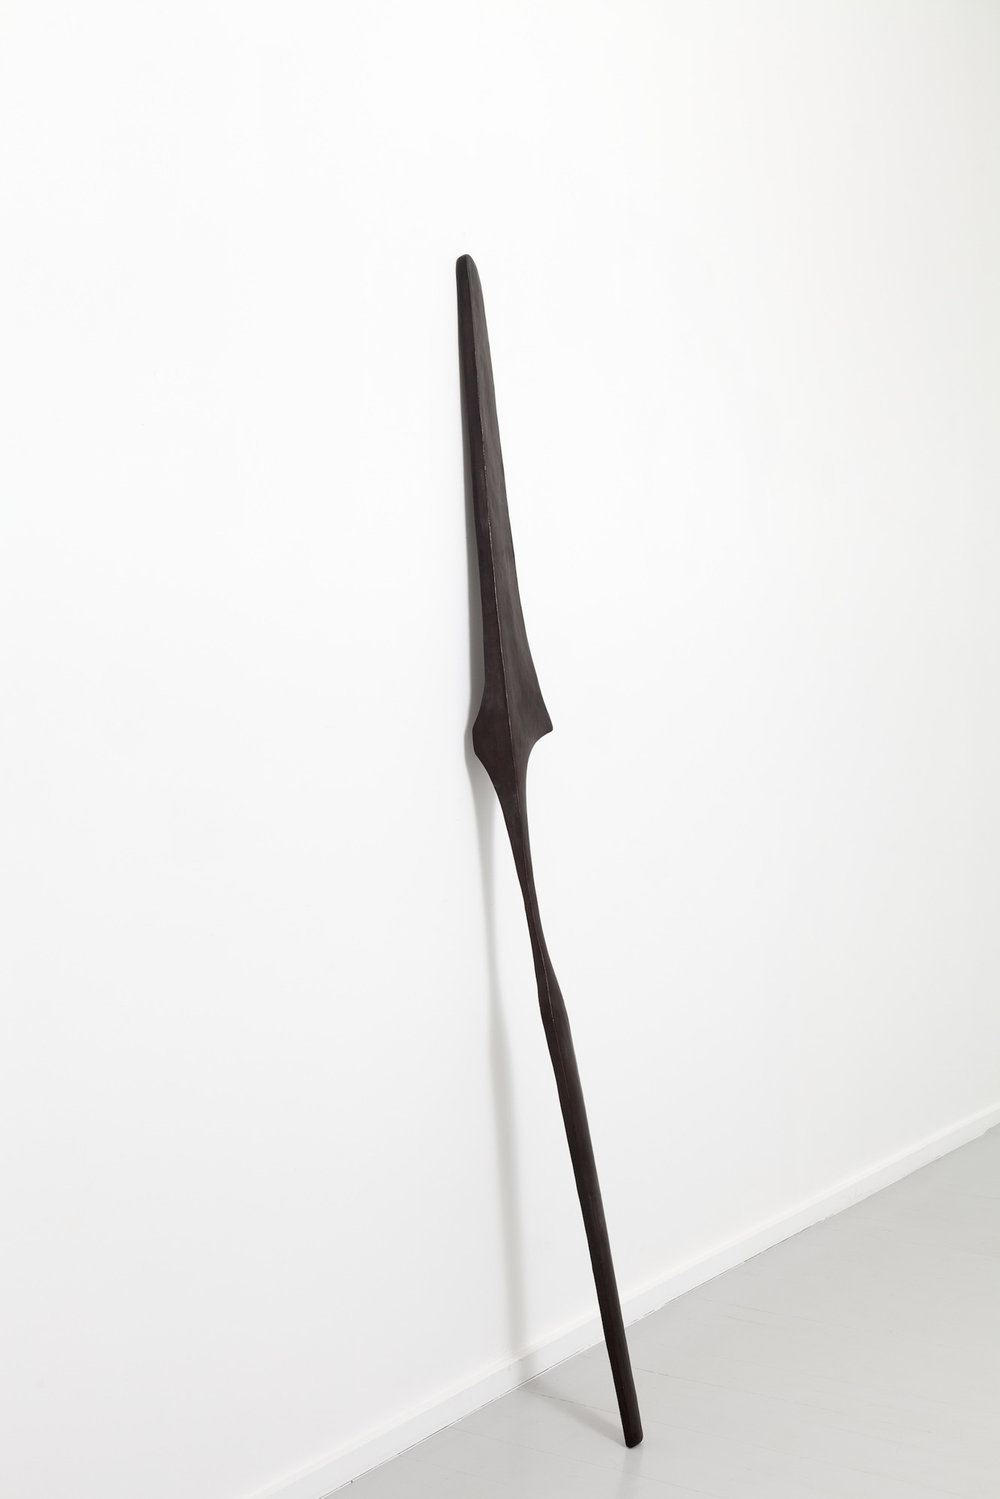 Sculpture VIII, 2017